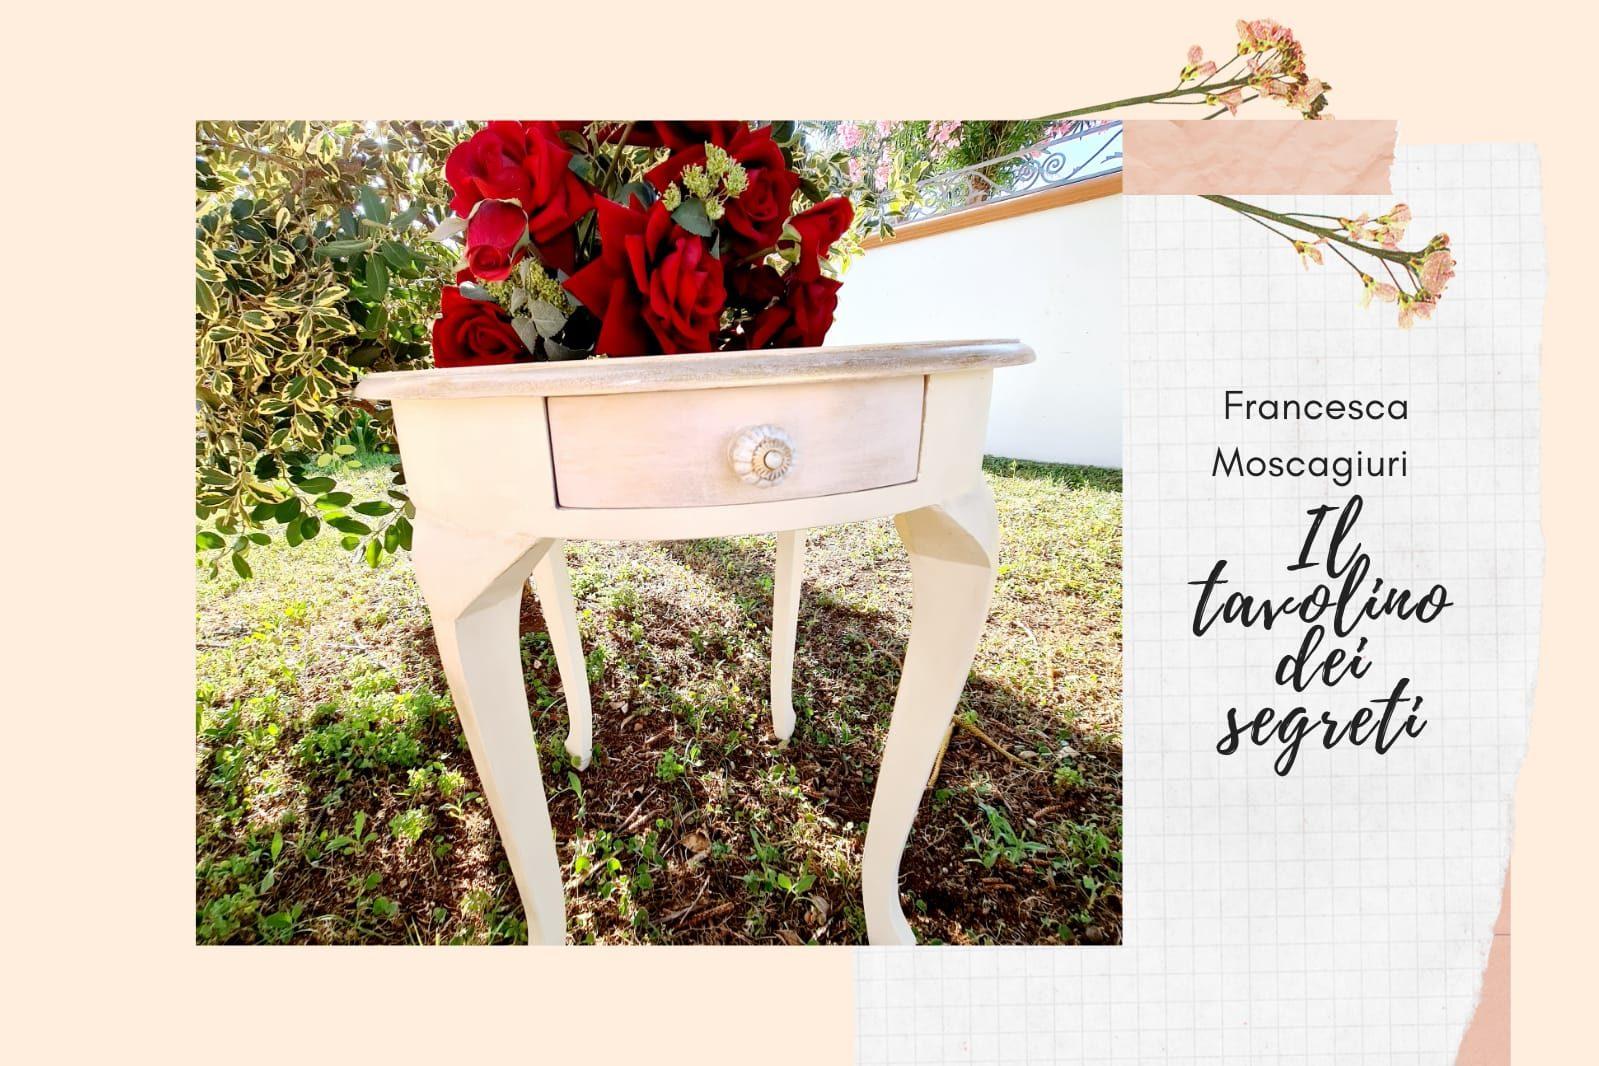 relooking-tavolino-i-laboratori-artistici-la-maison-nini-love-paint (4)